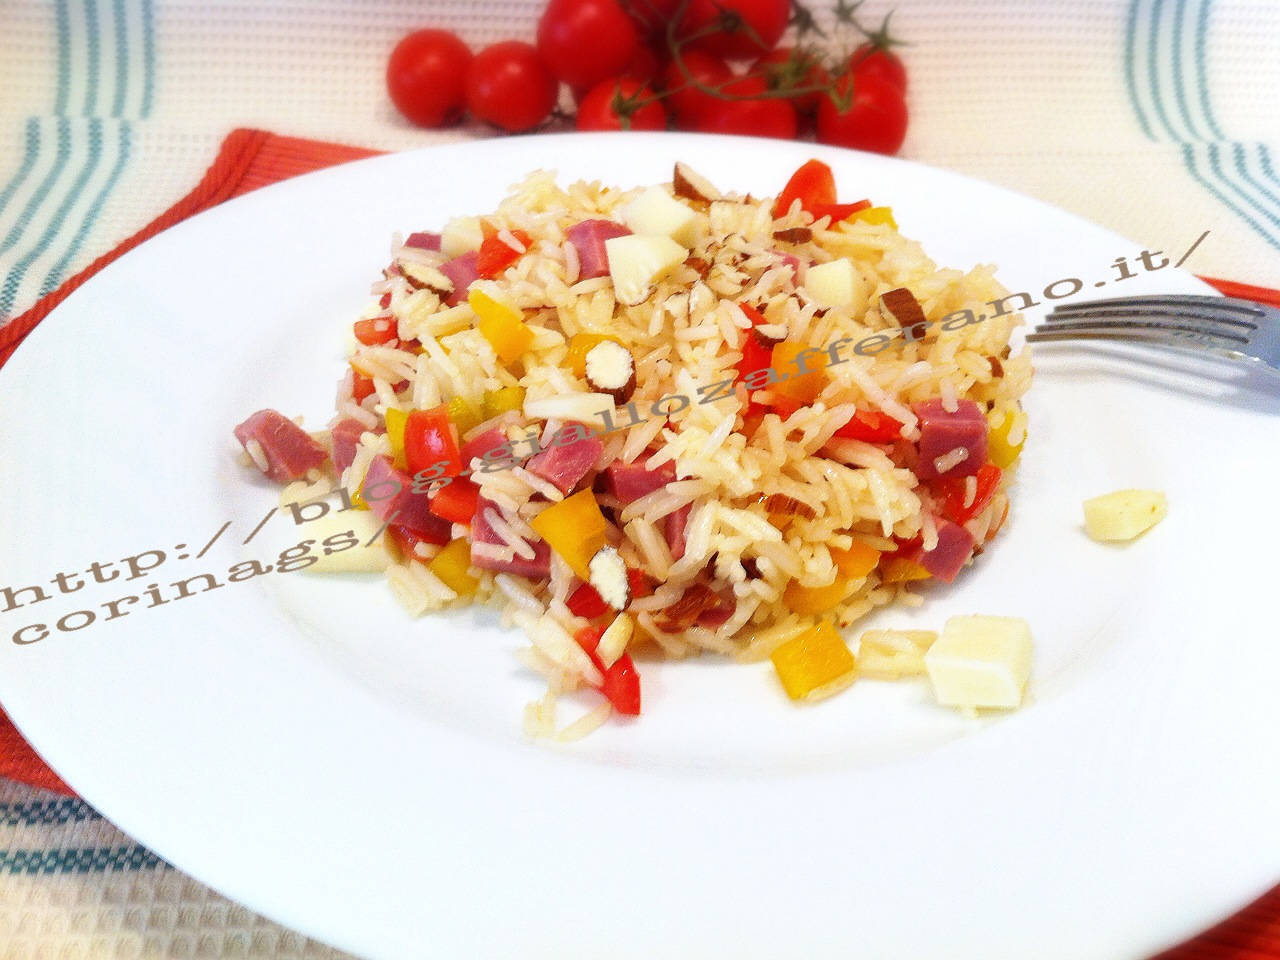 Insalata di riso basmati saporita|CorinaGS